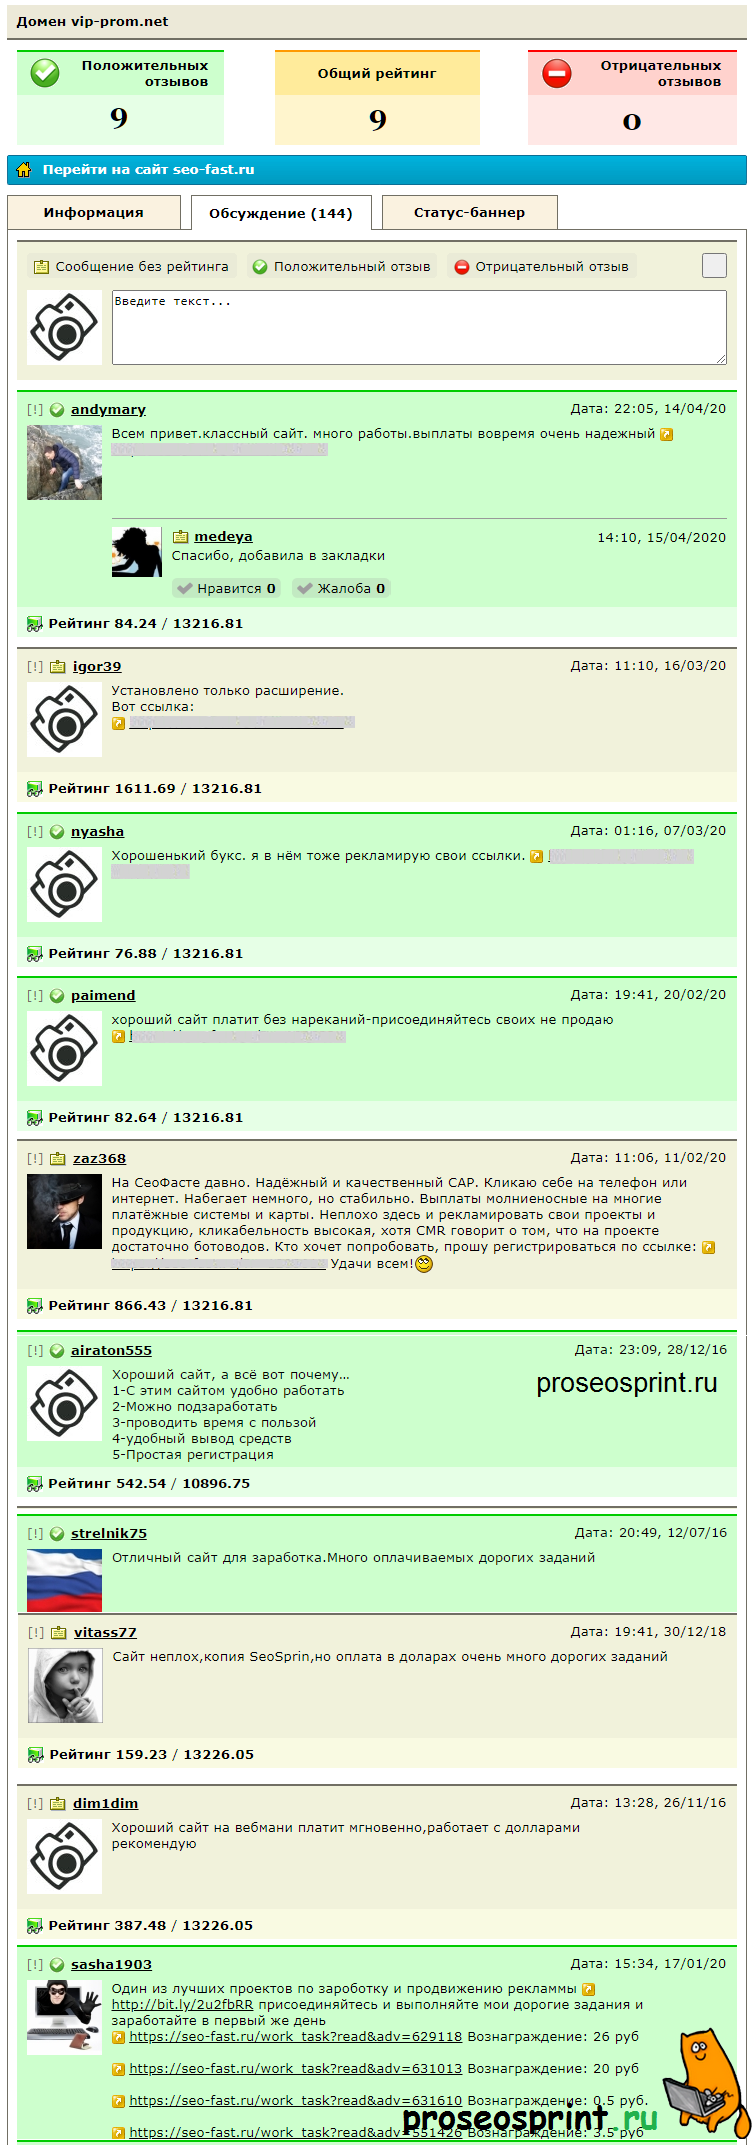 vip prom net, vip prom отзывы